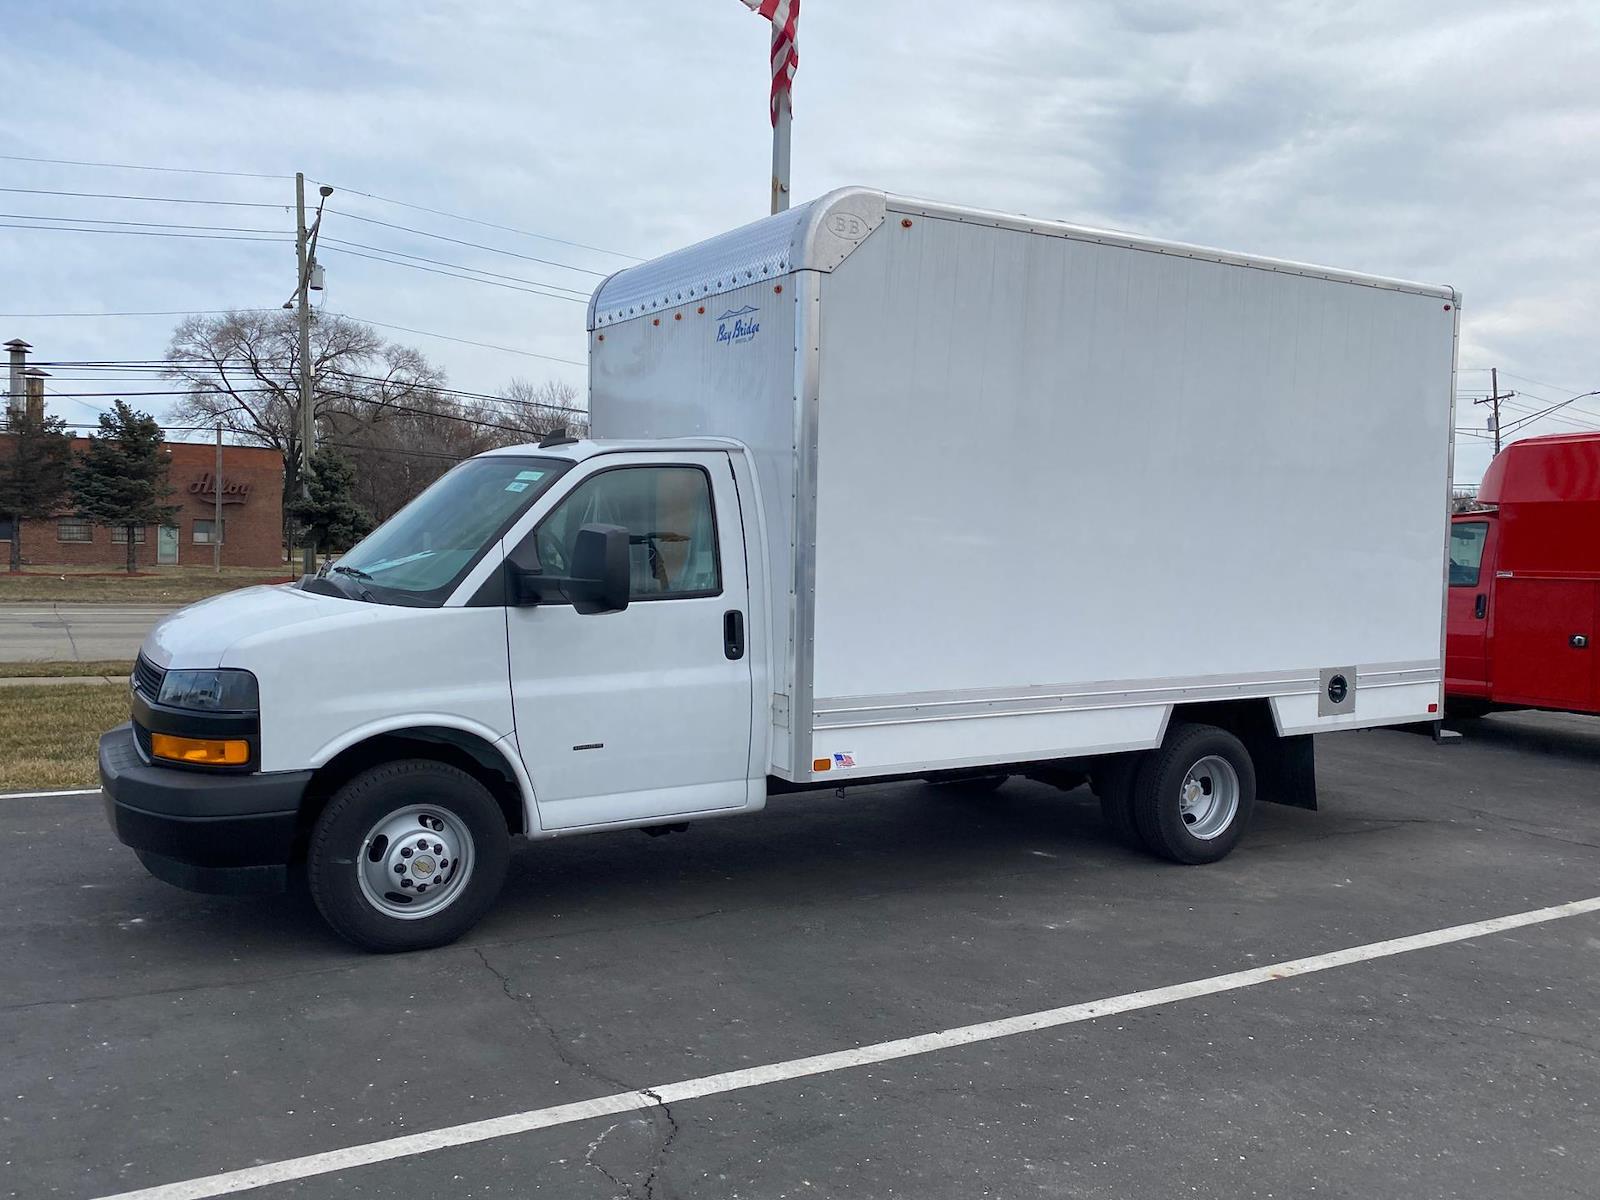 2020 Chevrolet Express 3500 4x2, Cutaway Van #A0369 - photo 1